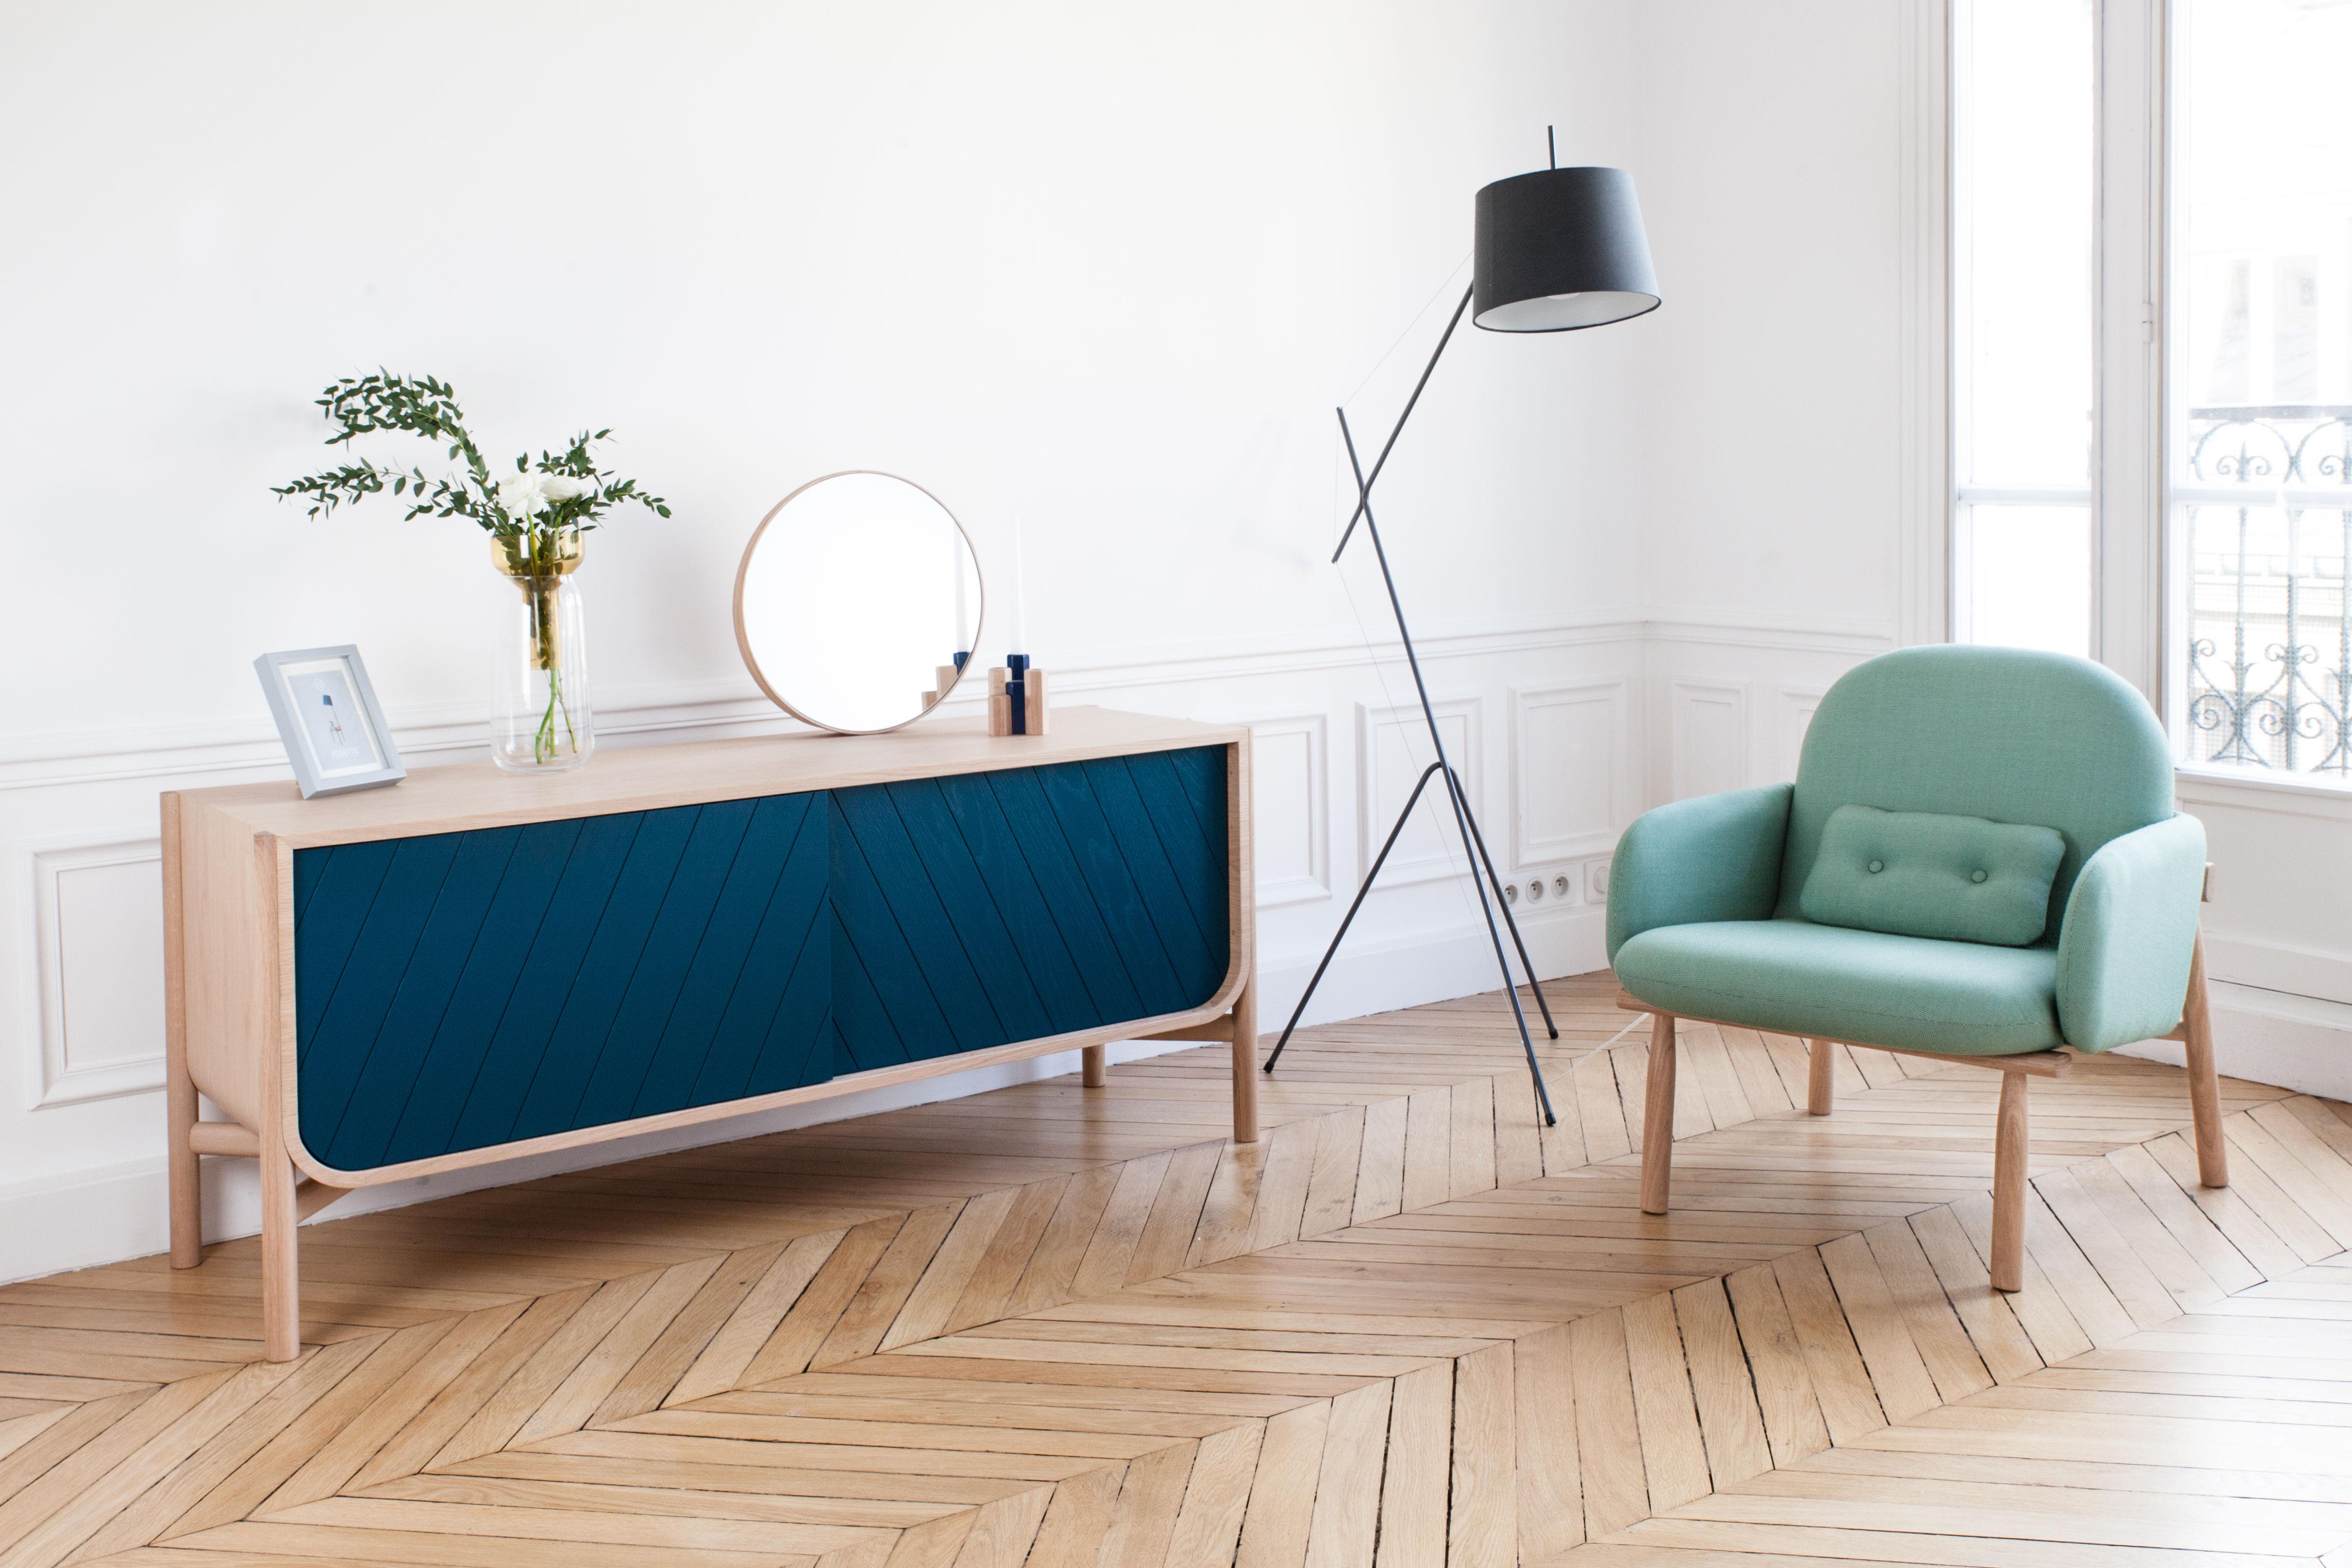 buffet marius meuble tv l 185 x h 65 cm bleu p trole ch ne naturel hart made in design. Black Bedroom Furniture Sets. Home Design Ideas